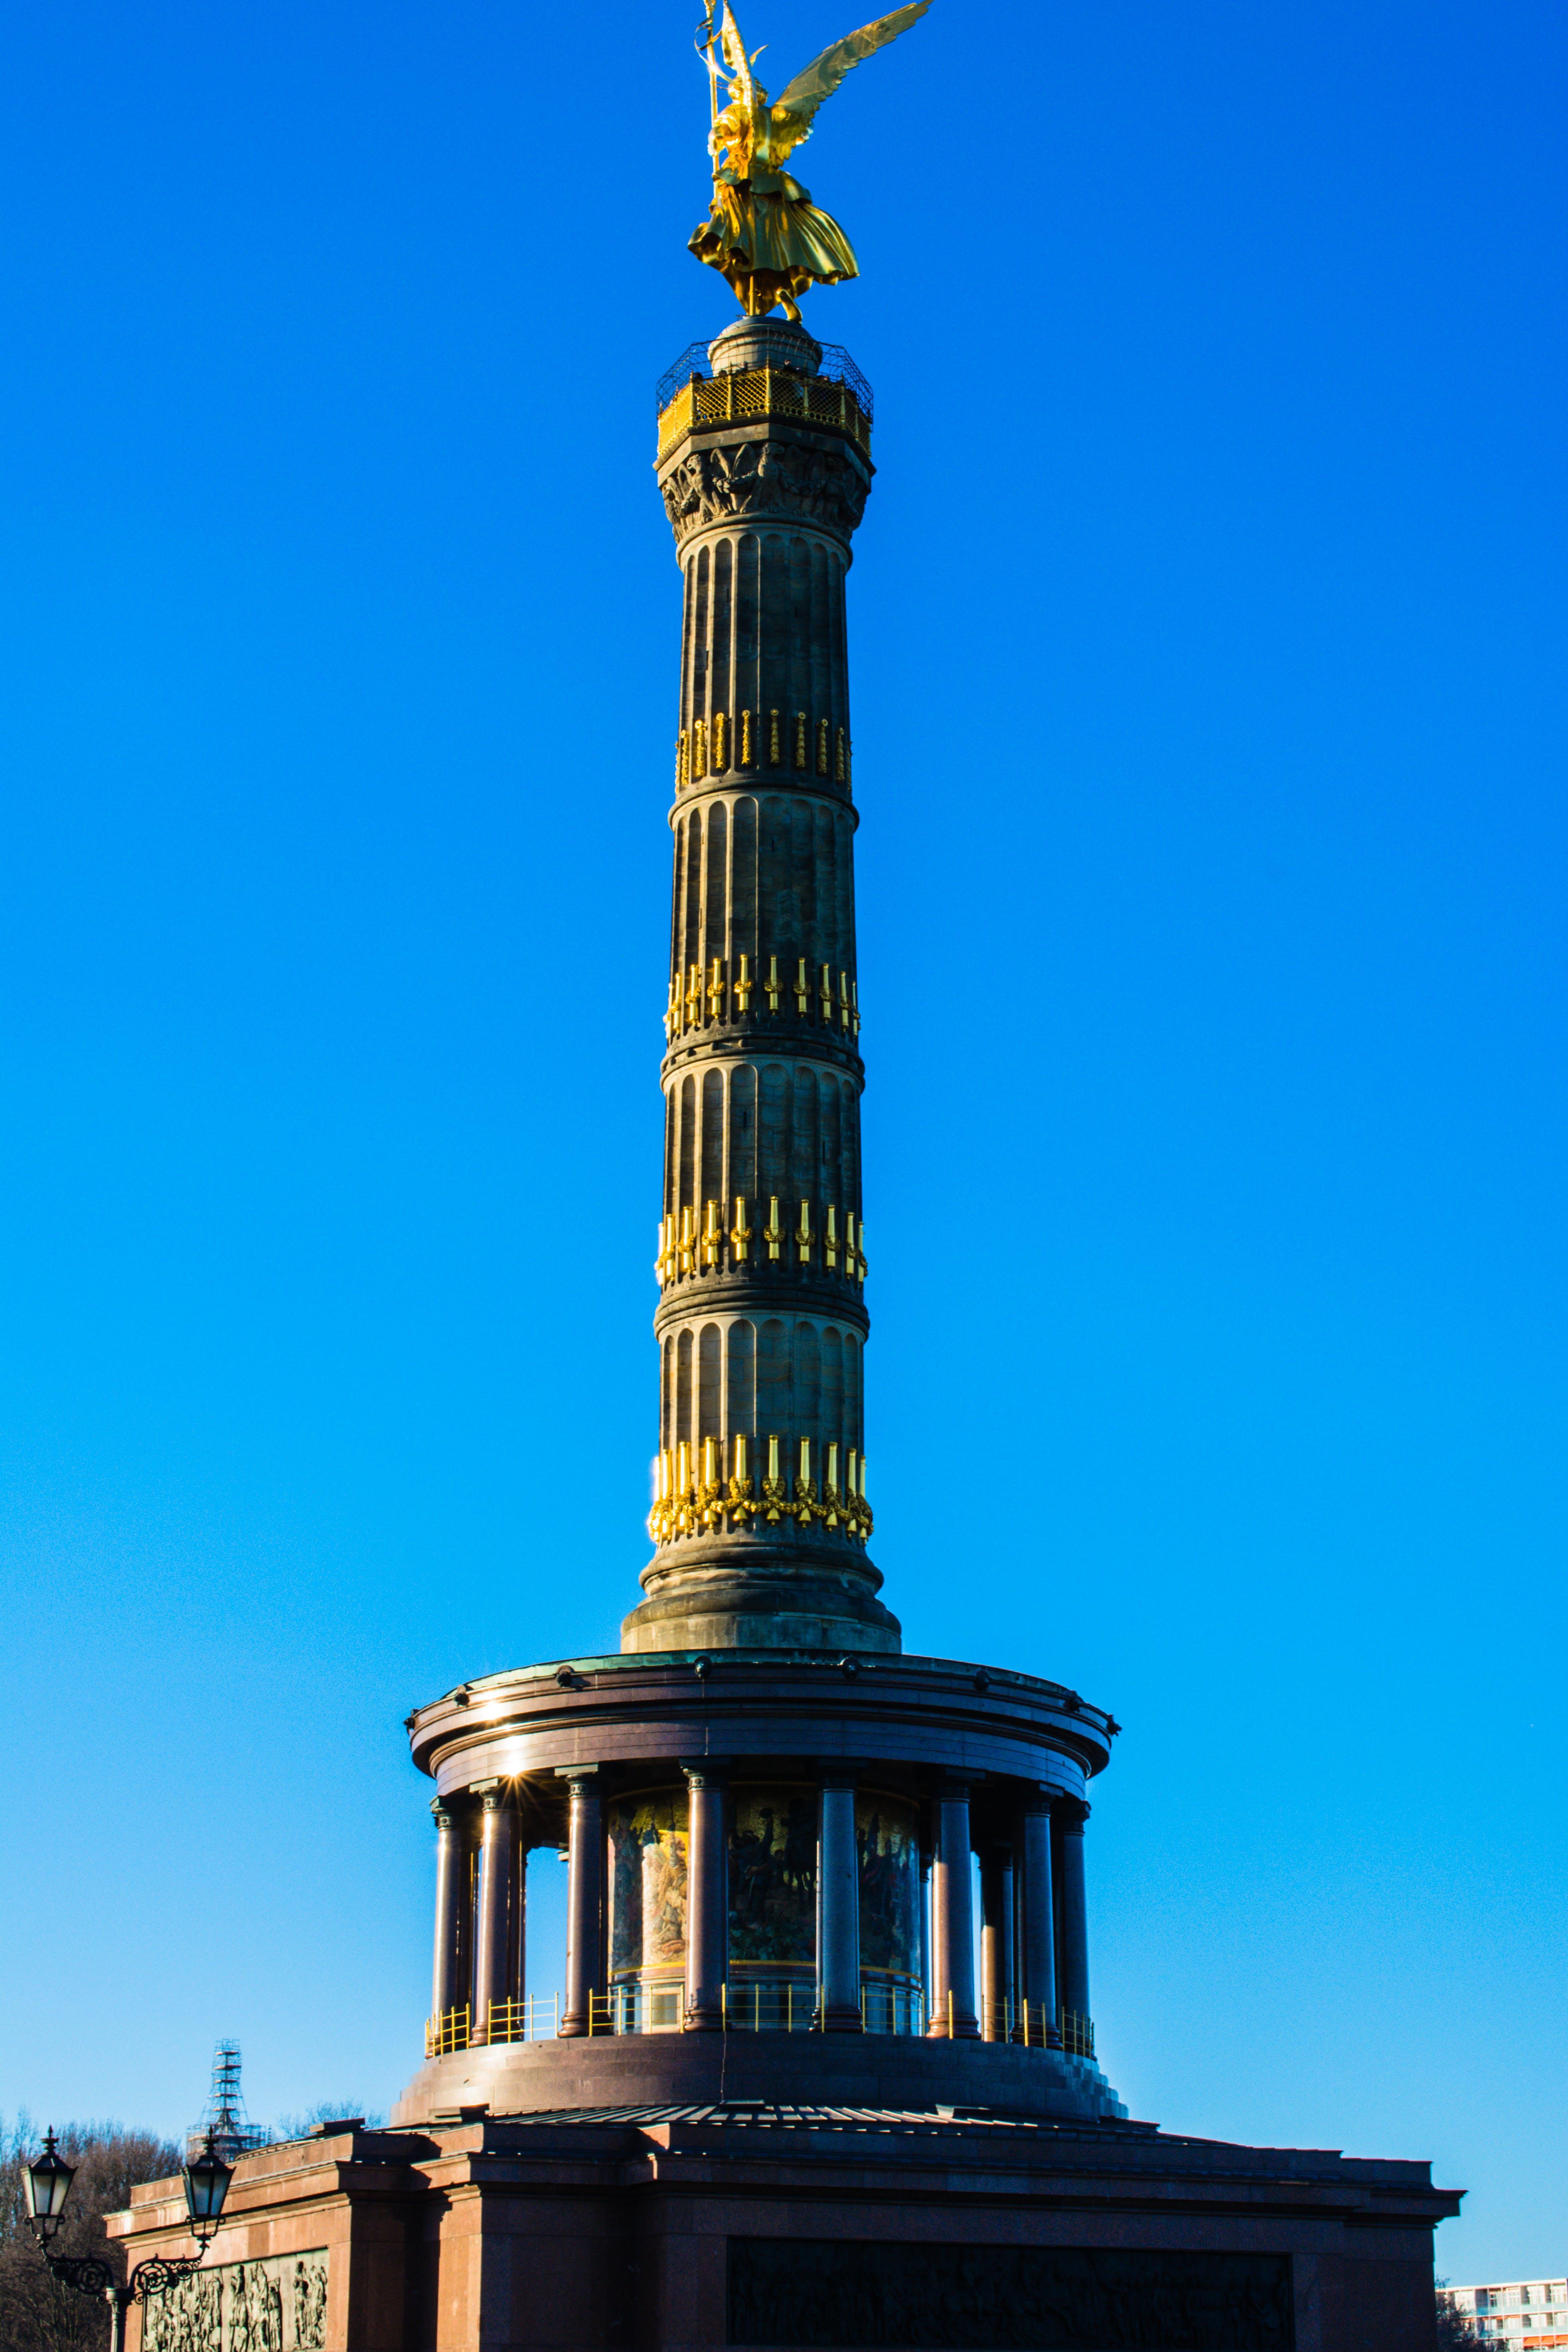 Free stock photo of berlin, blue sky, city, großer stern